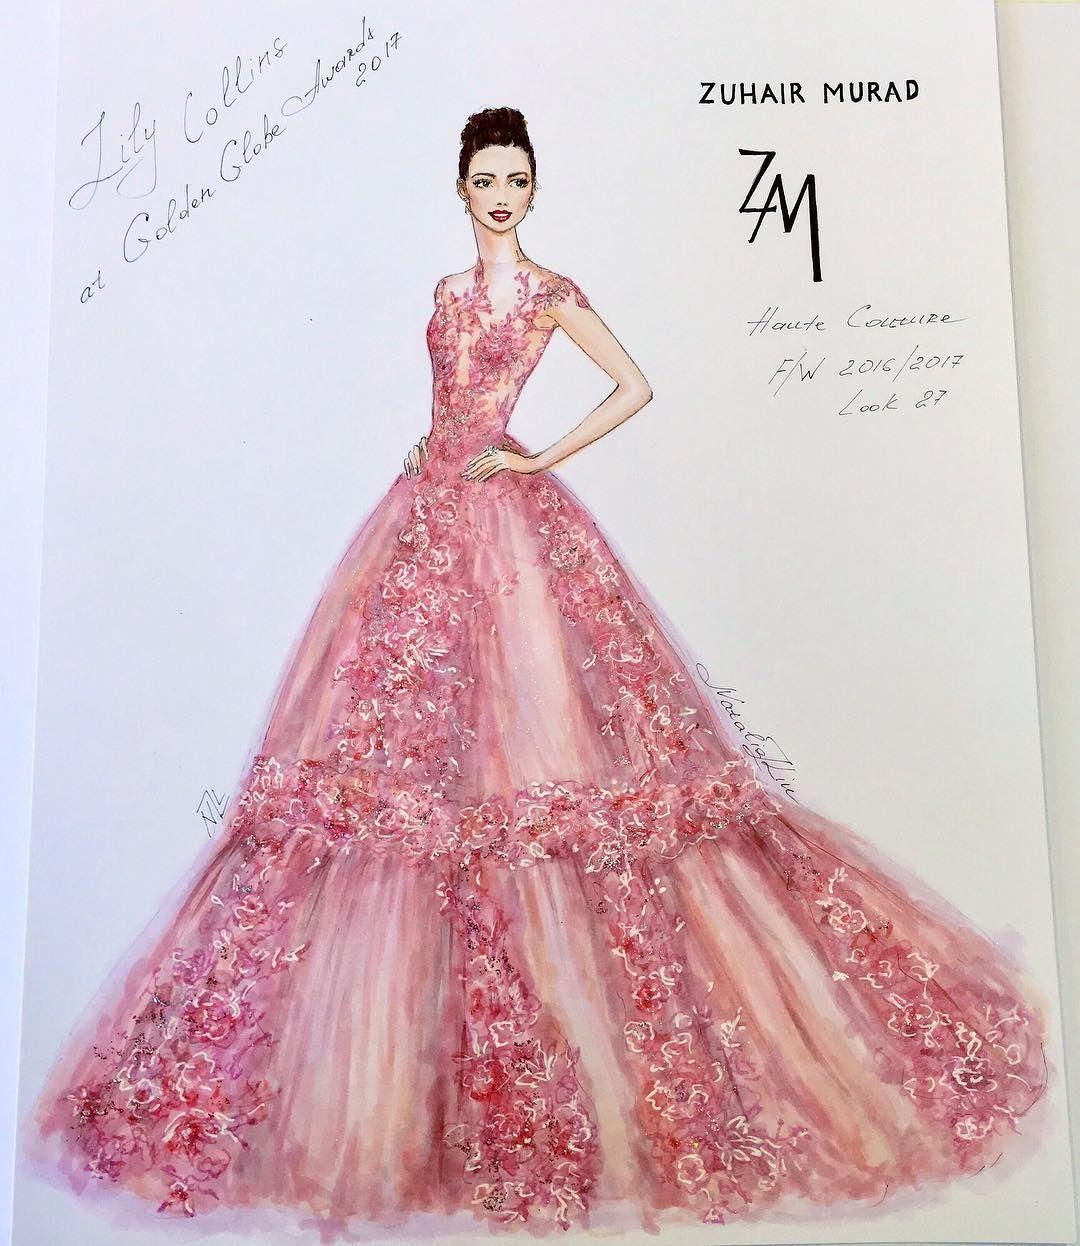 Pin de Alleisha jw.org en Couture, design and patterns | Pinterest ...